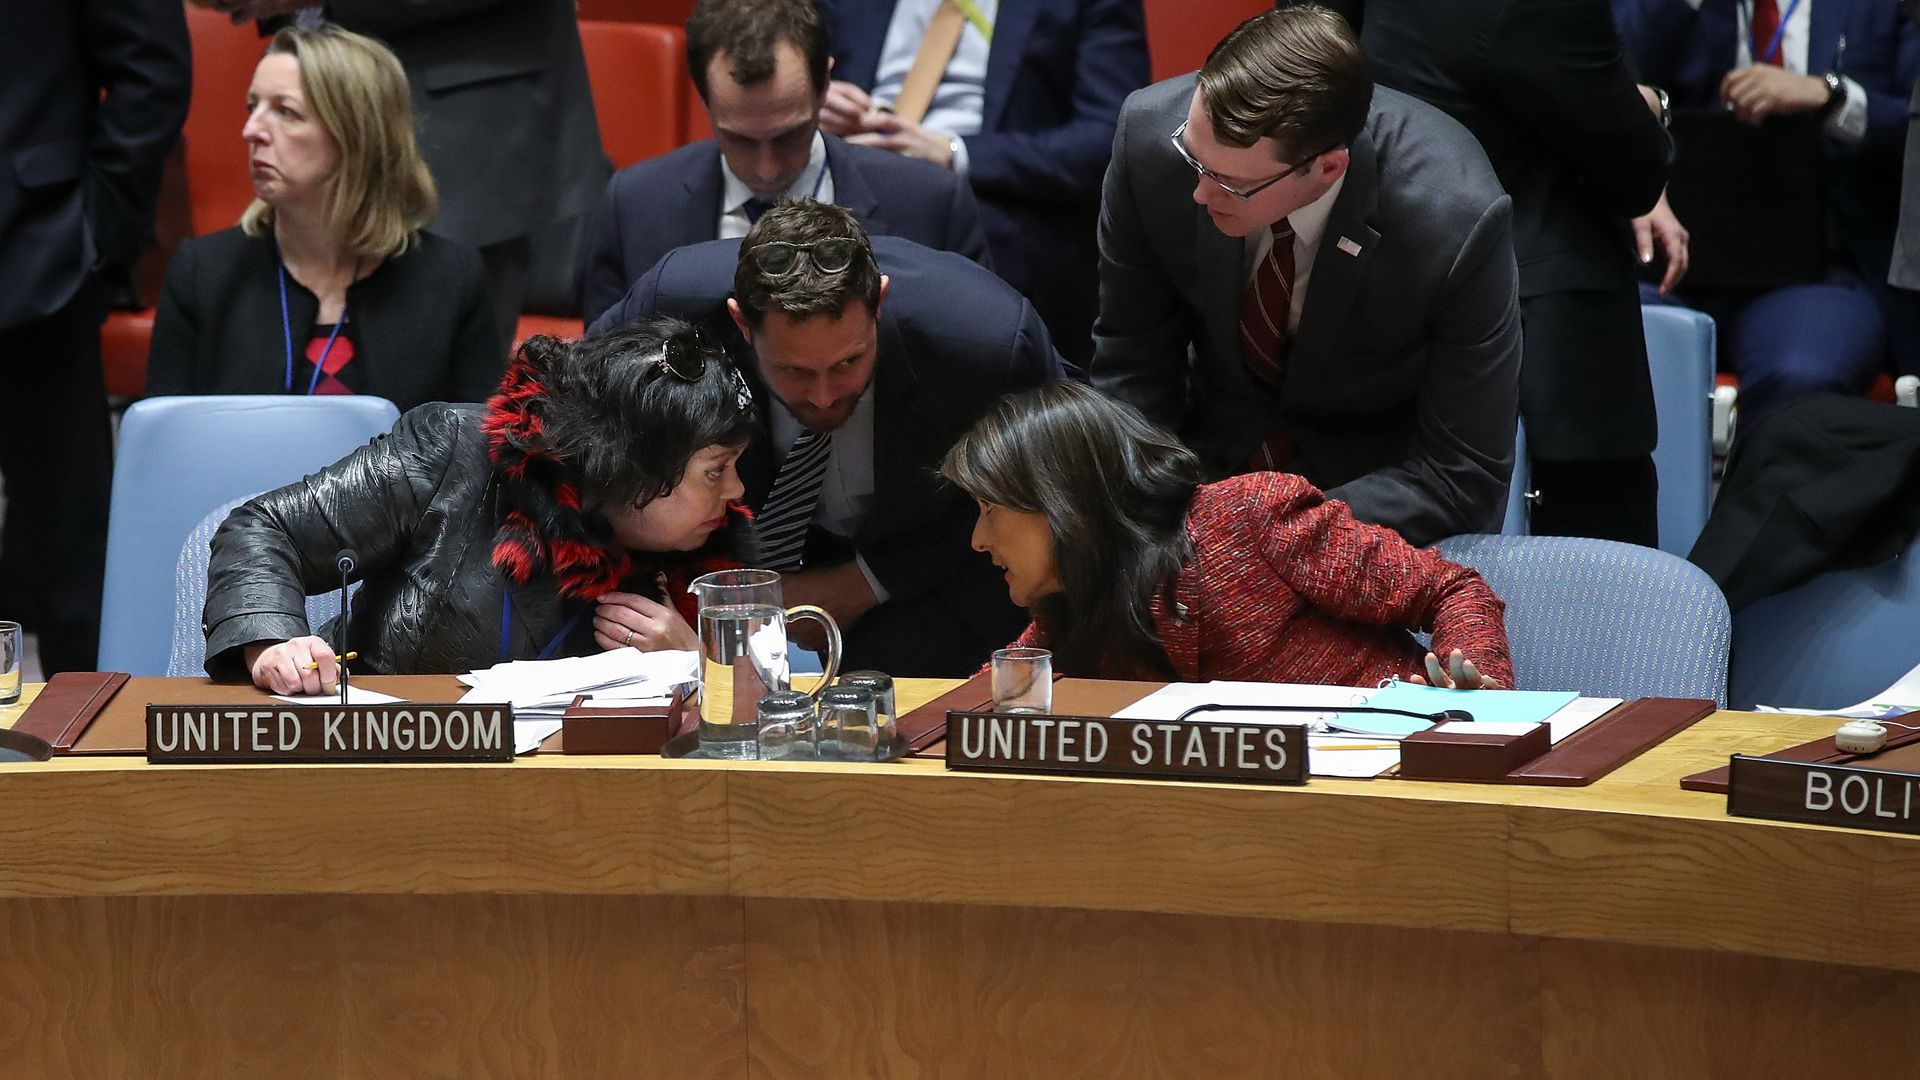 UN ambassadors from the U.K. (Karen Pierce) and U.S. (Nikky Haley) talk during a Security Council meeting